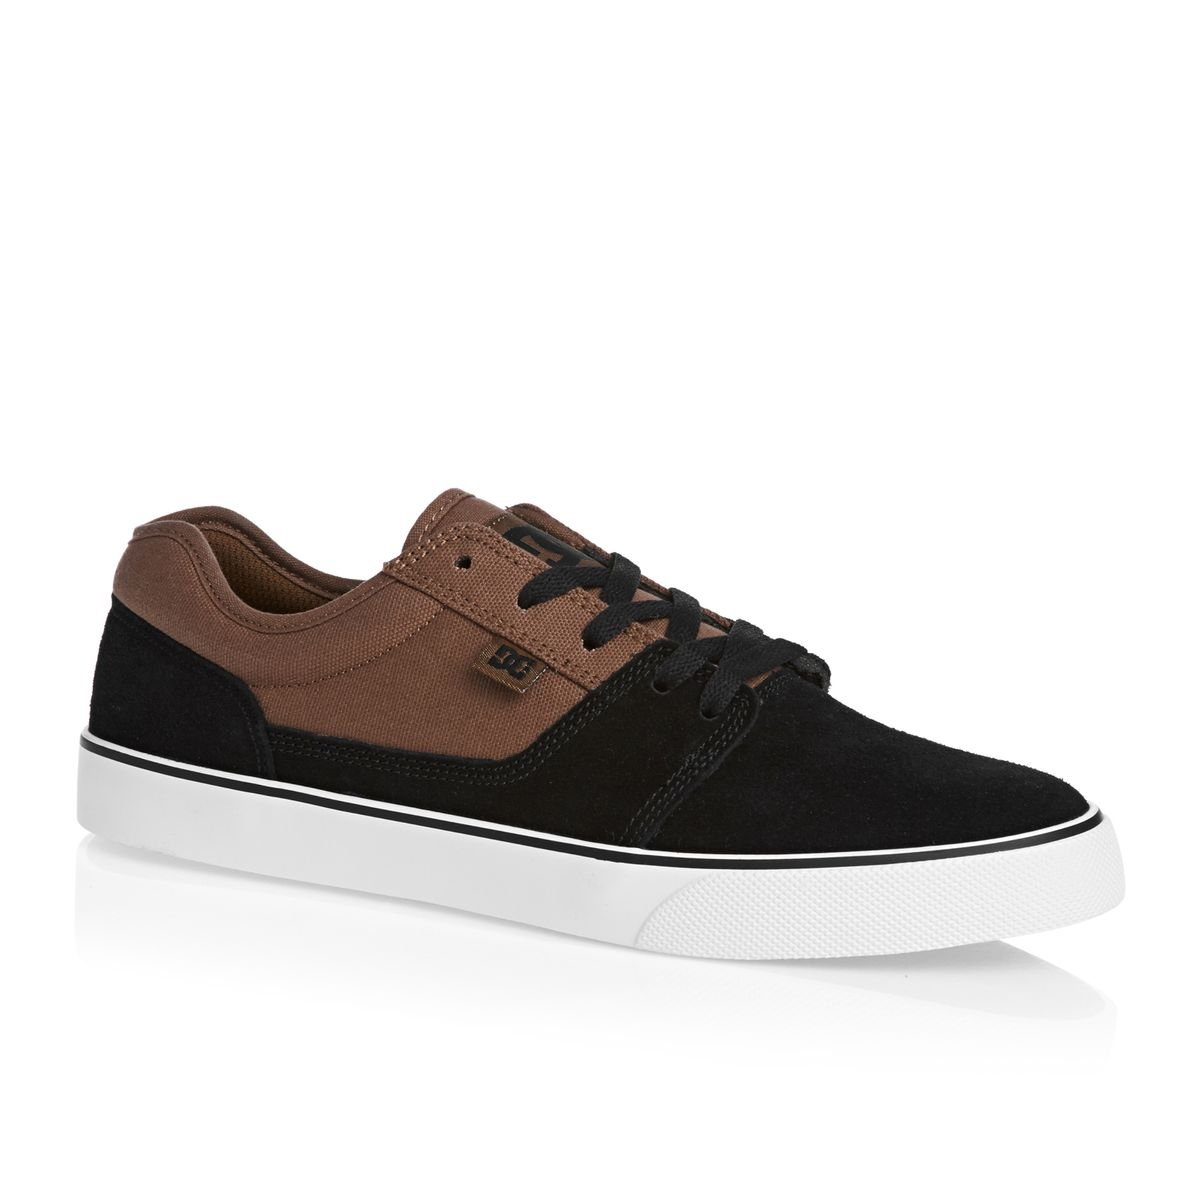 DC TONIK Unisex-Erwachsene Sneakers  40 EU|Black/Camel